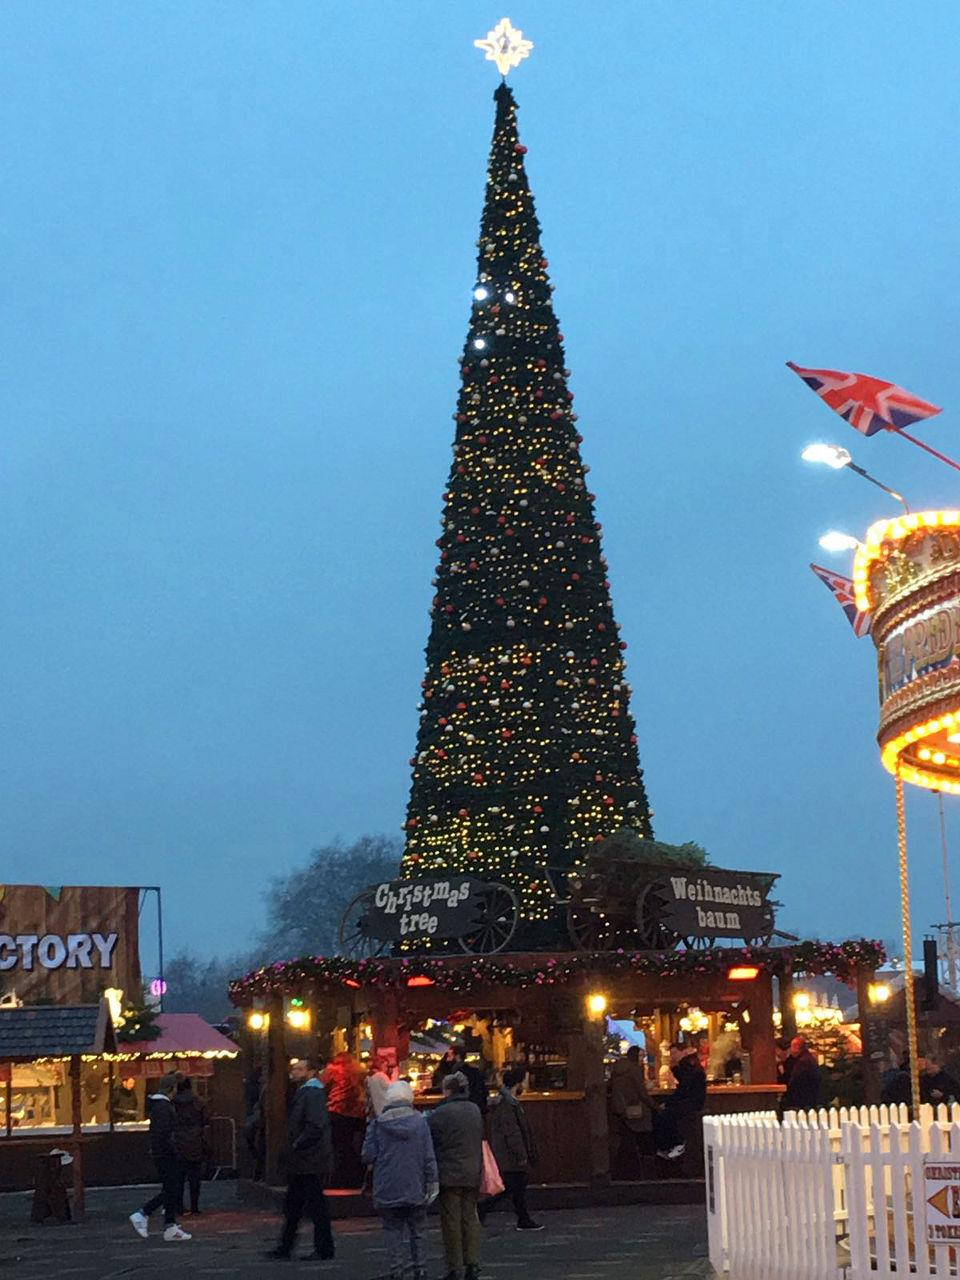 Xmas tree at Winter Wonderland.